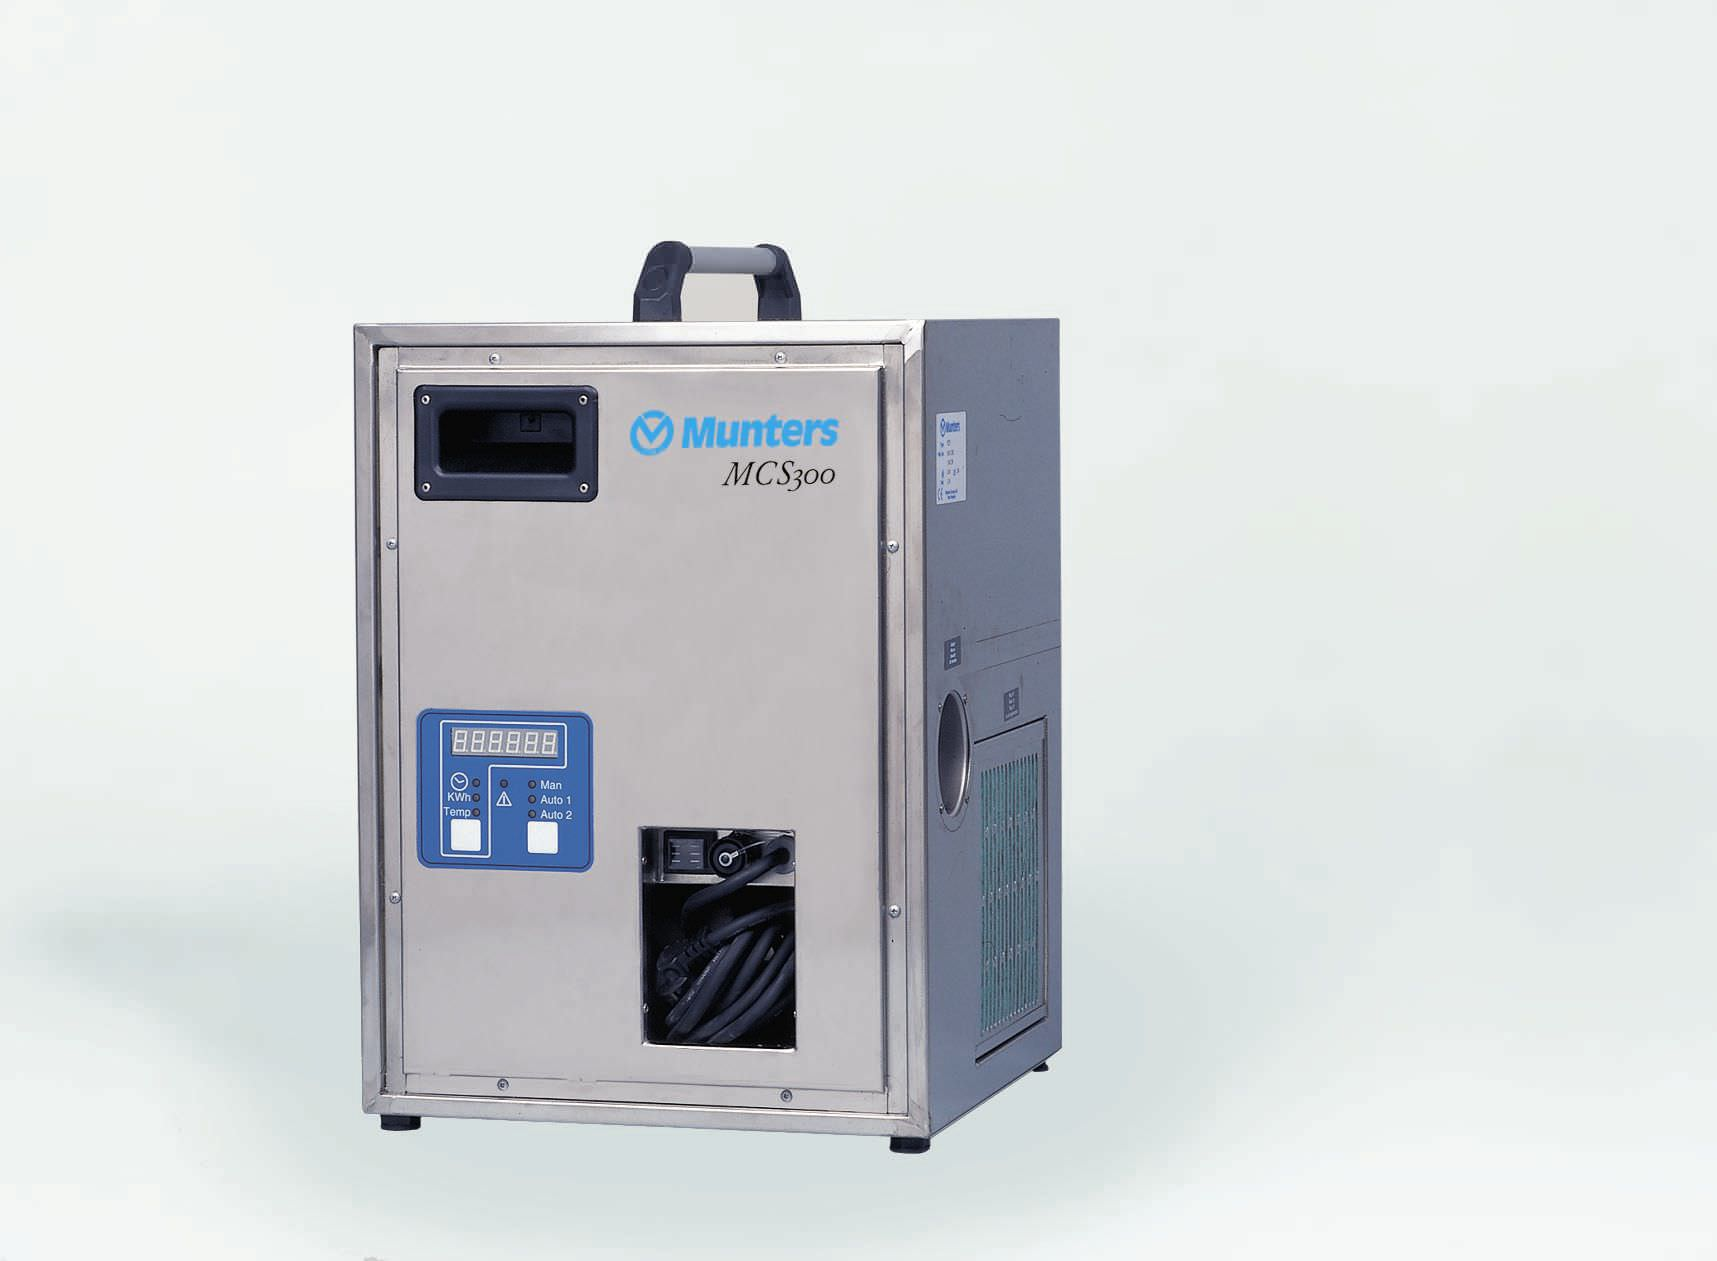 Desiccant dehumidifier   stationary   air   60   300 m  h   MCS300. Desiccant dehumidifier   stationary   air   60   300 m  h   MCS300